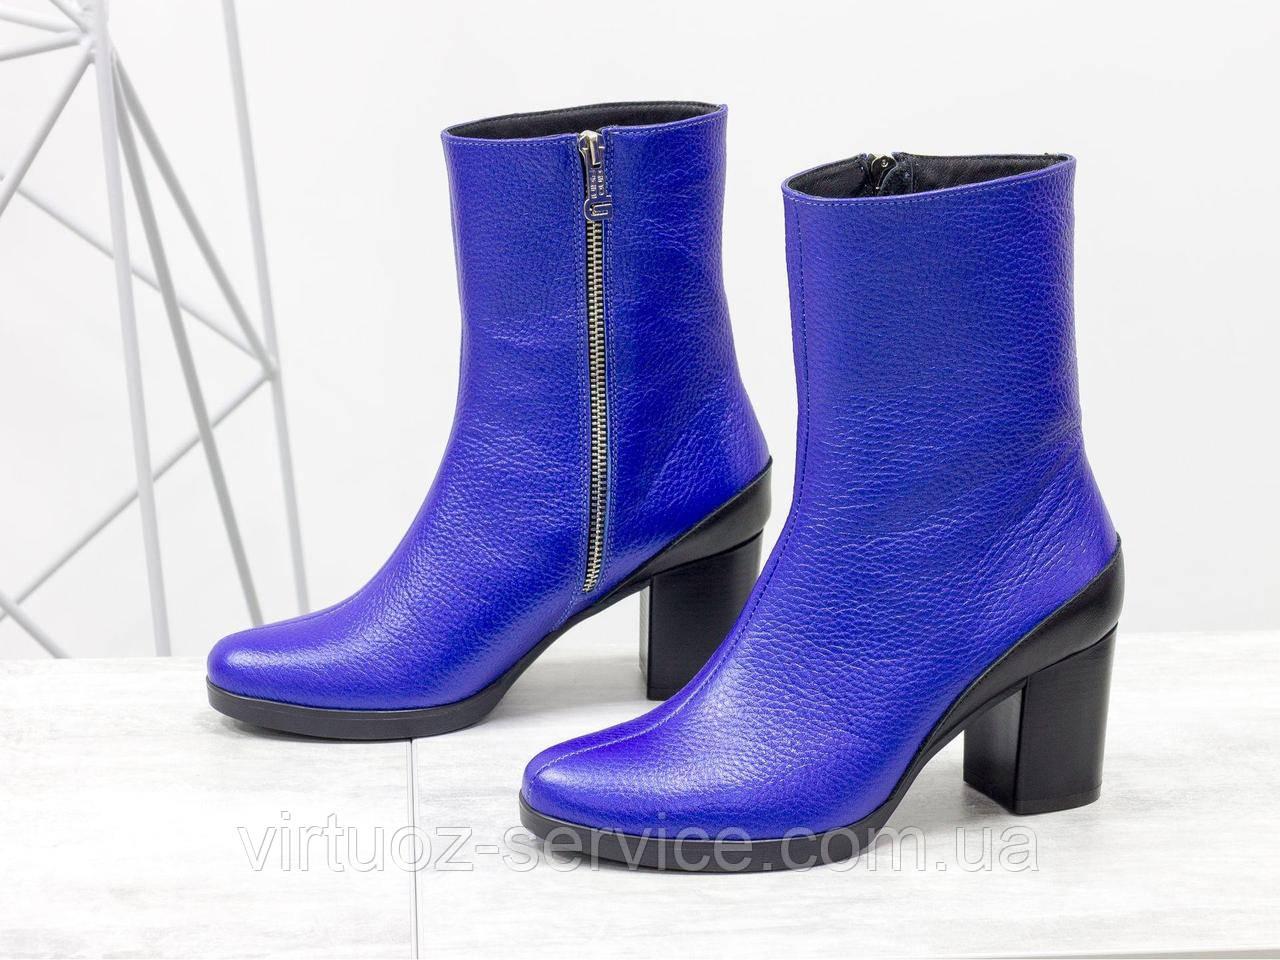 Ботинки женские Gino Figini Б-17456/2-02 из натуральной кожи 37 Синий